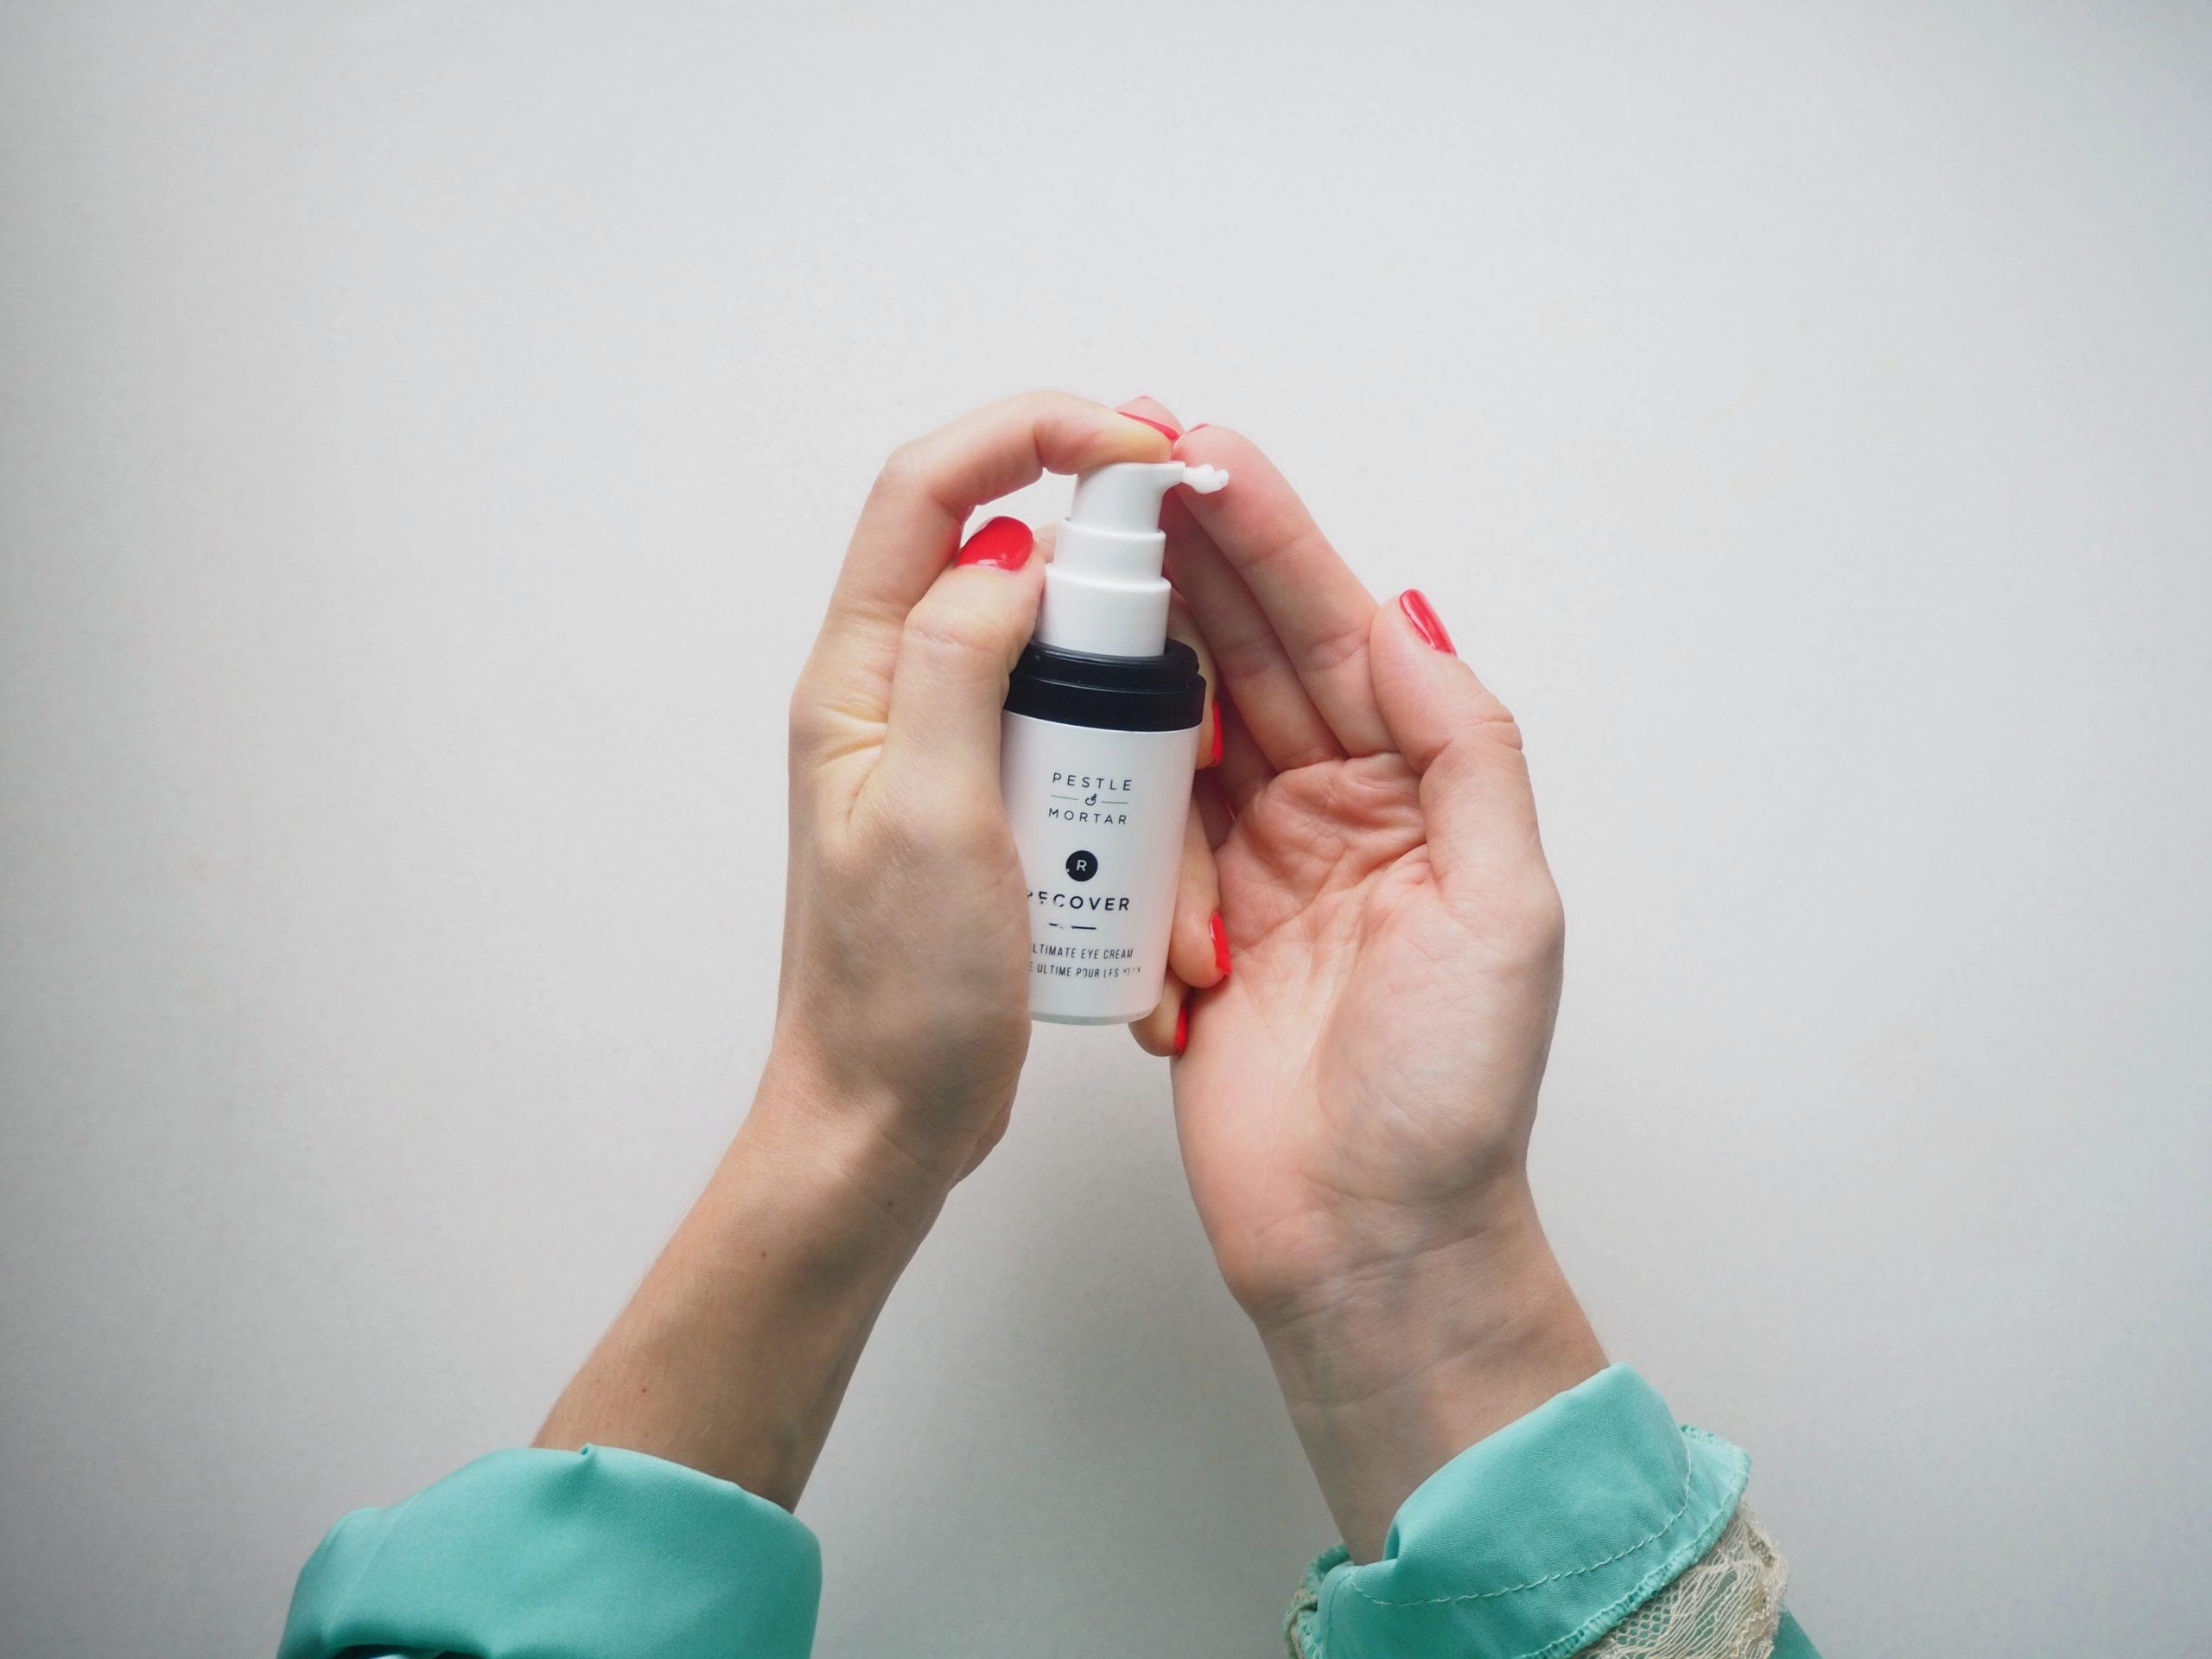 Review: Creme de olhos hidratante Pestle & Mortar Recover Eye Cream